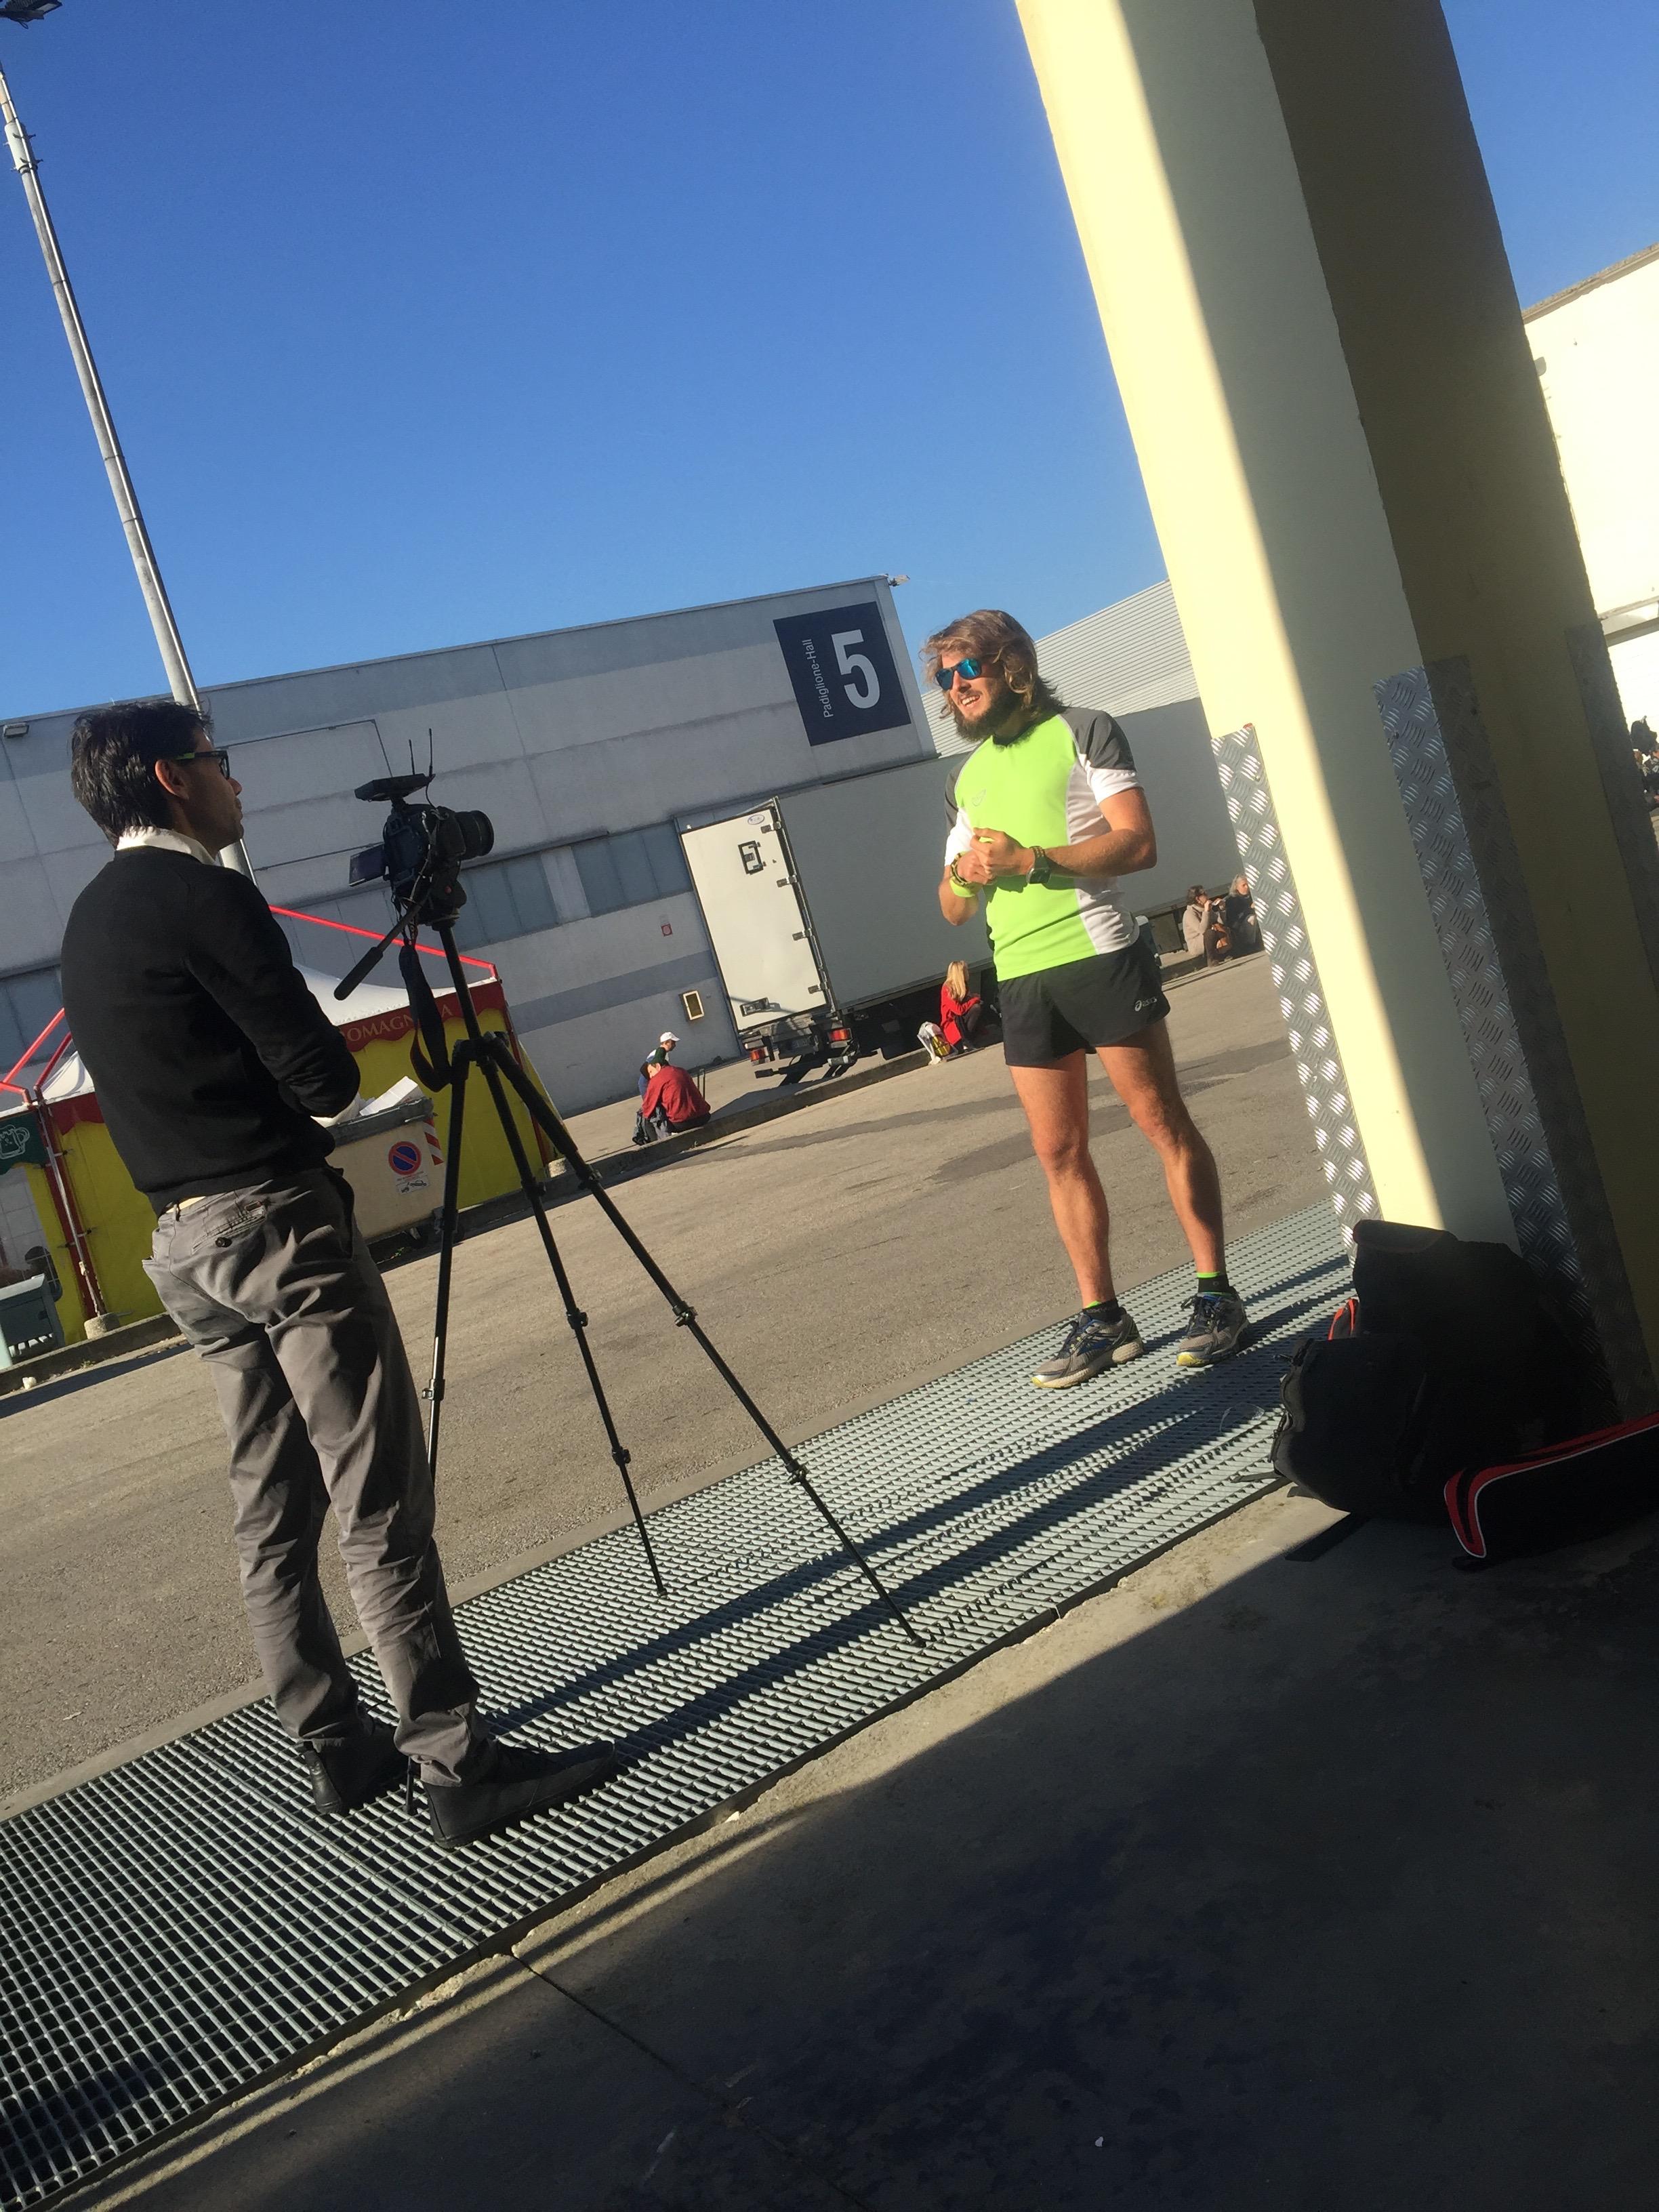 Andrea Bianchi intervista Andrea Budu Toniolo - Copyright Alice Bianchi